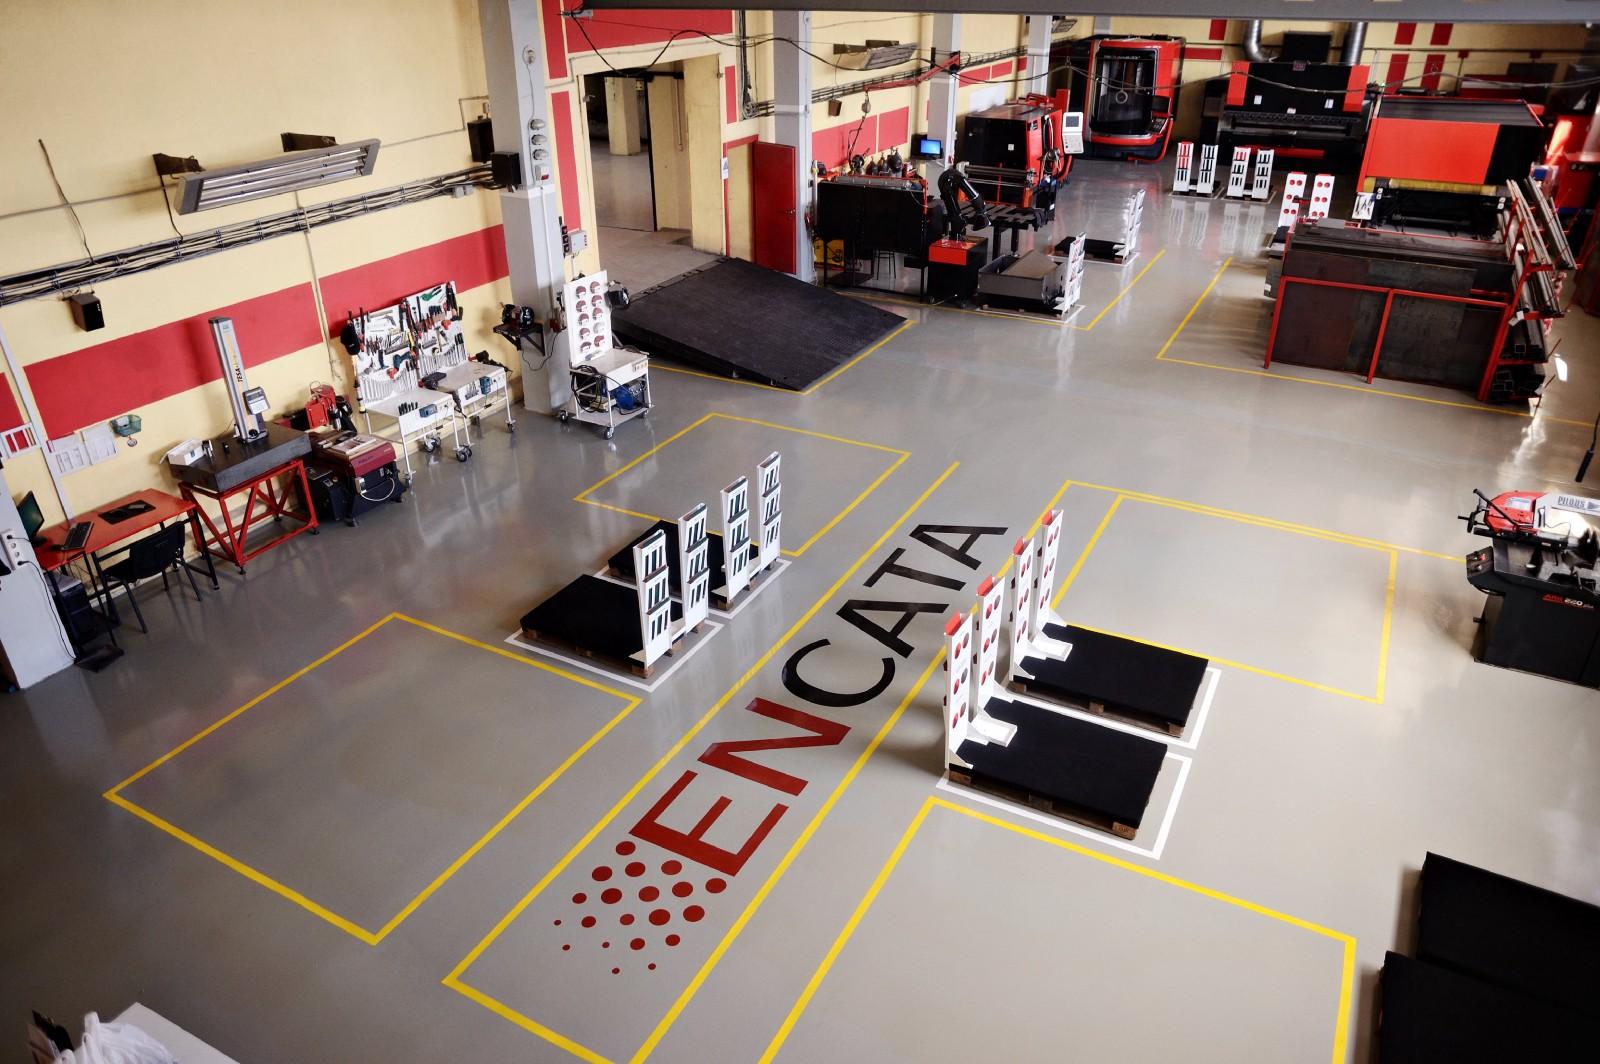 Jedno z R&D center EnCaty